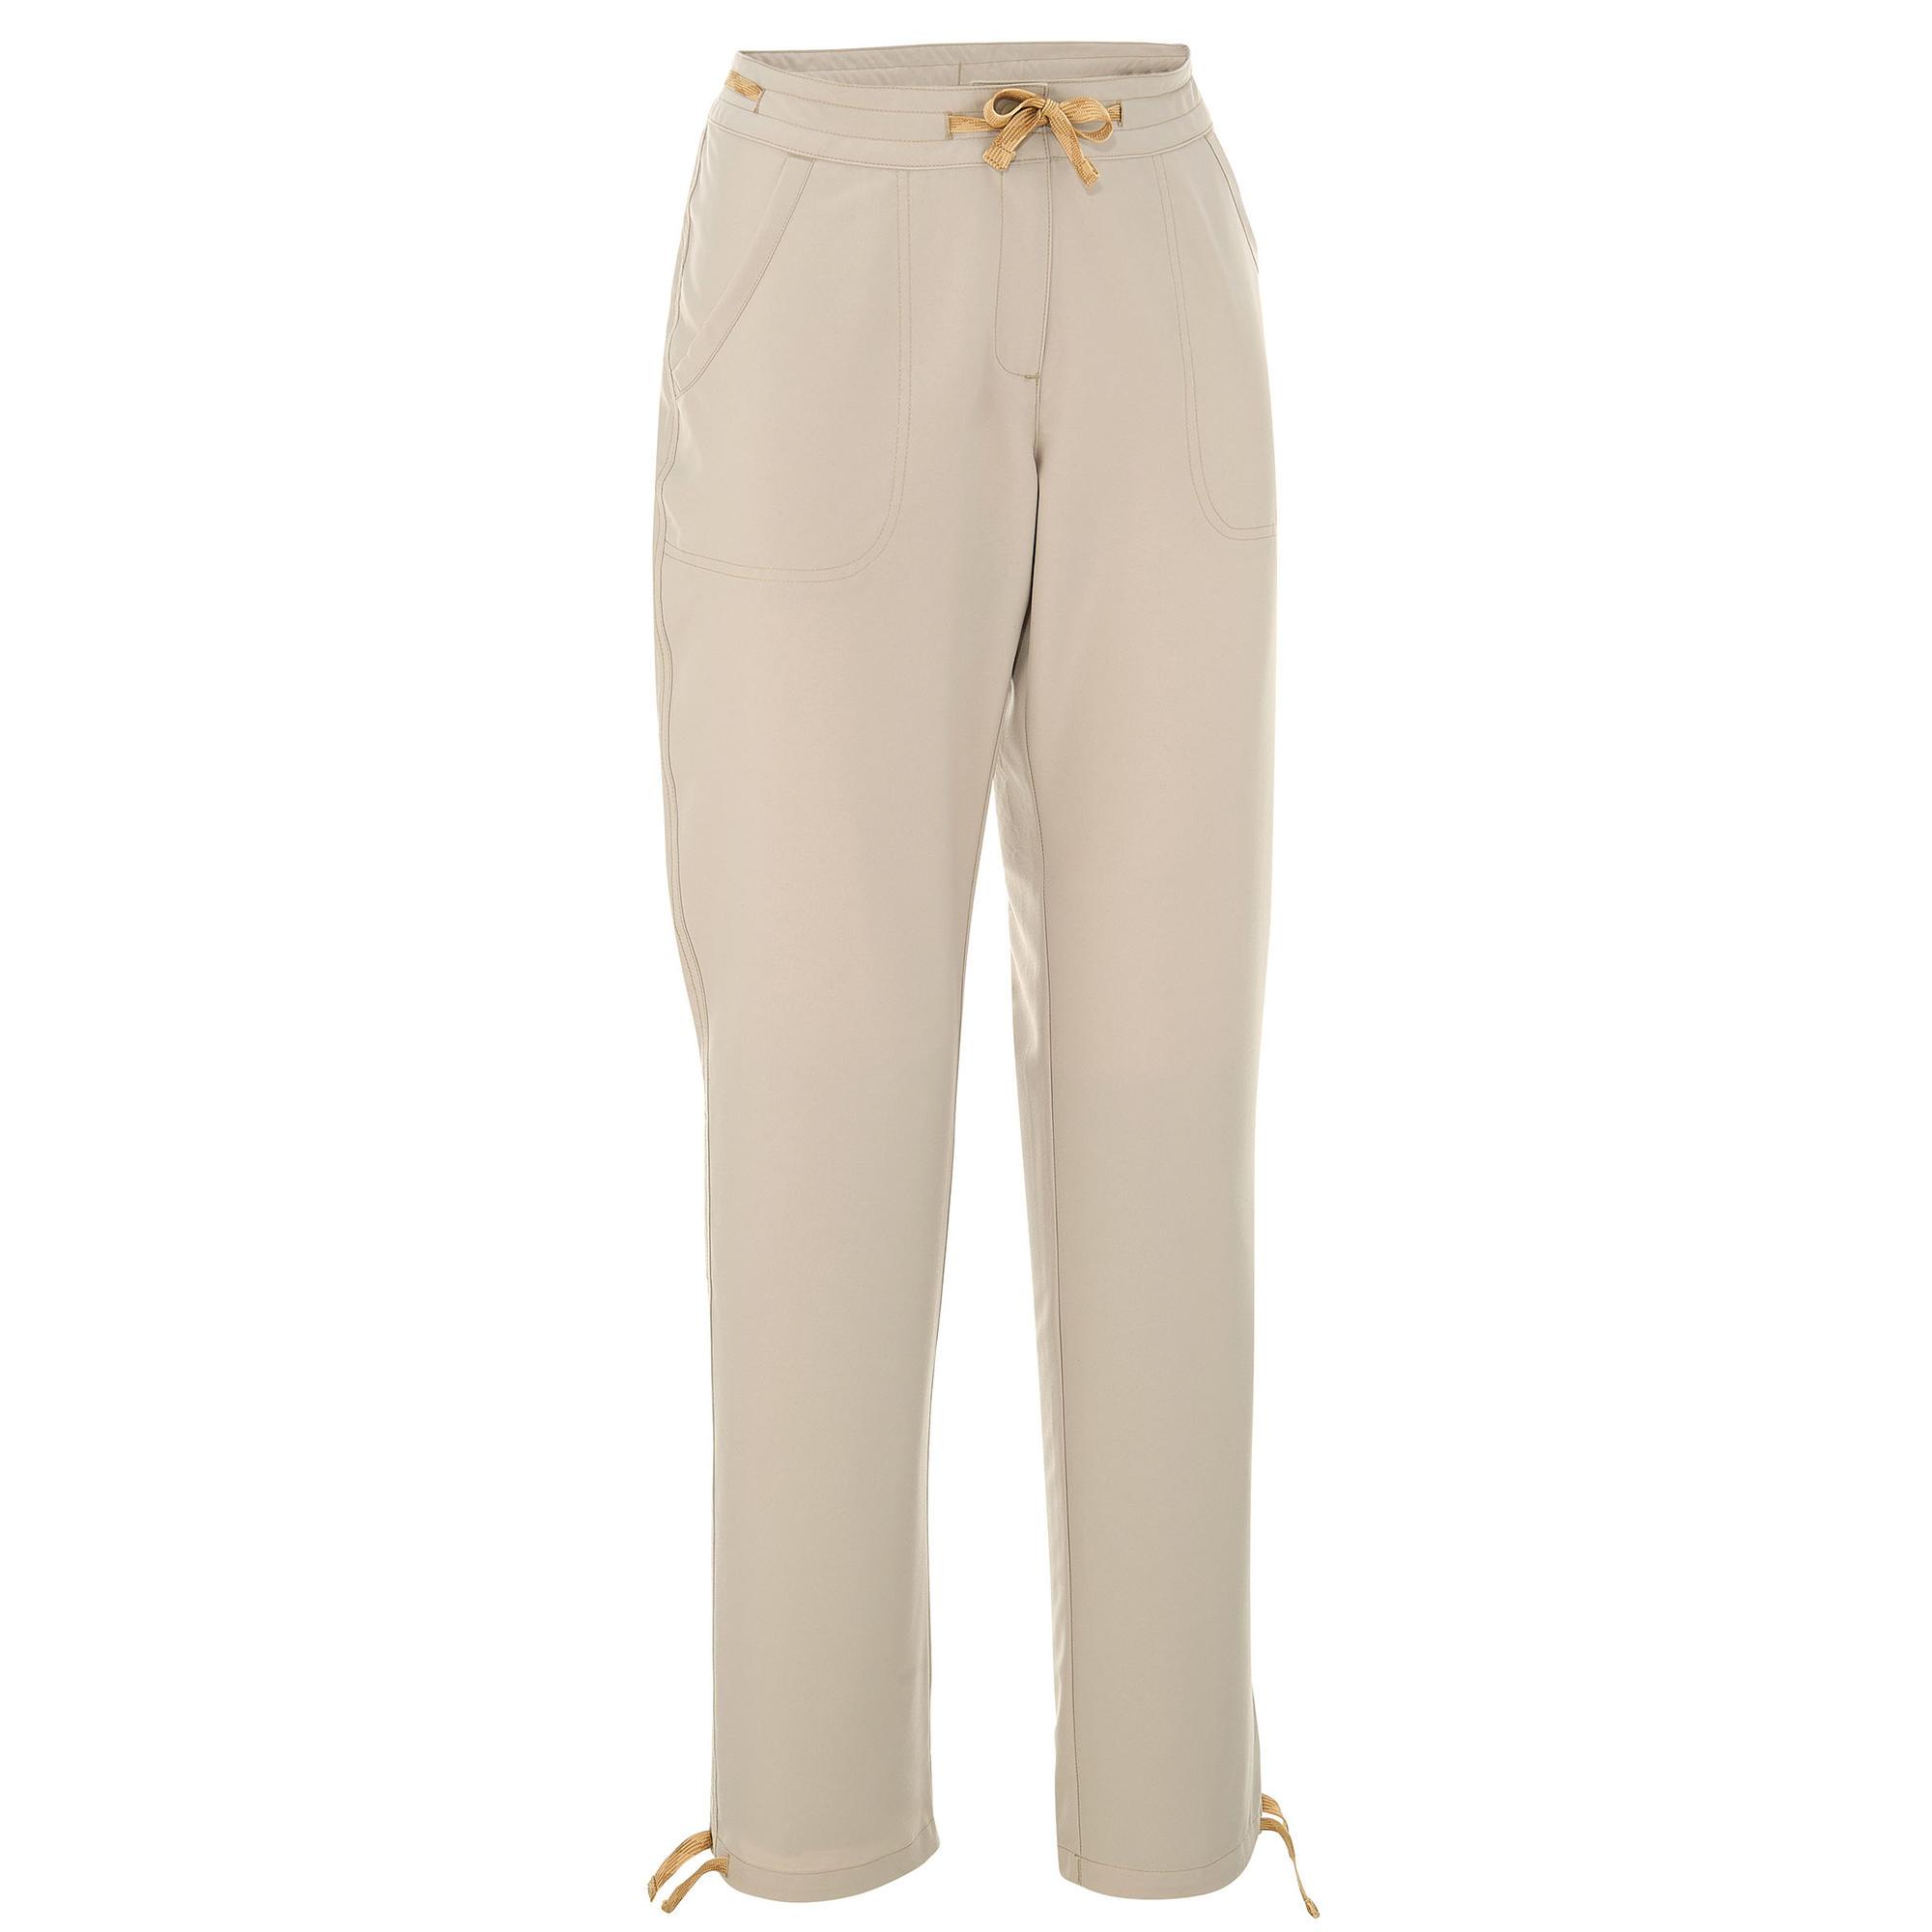 acheter pas cher fff2e 1a603 pantalon randonnee femme decathlon,Pantalon randonn茅e ...